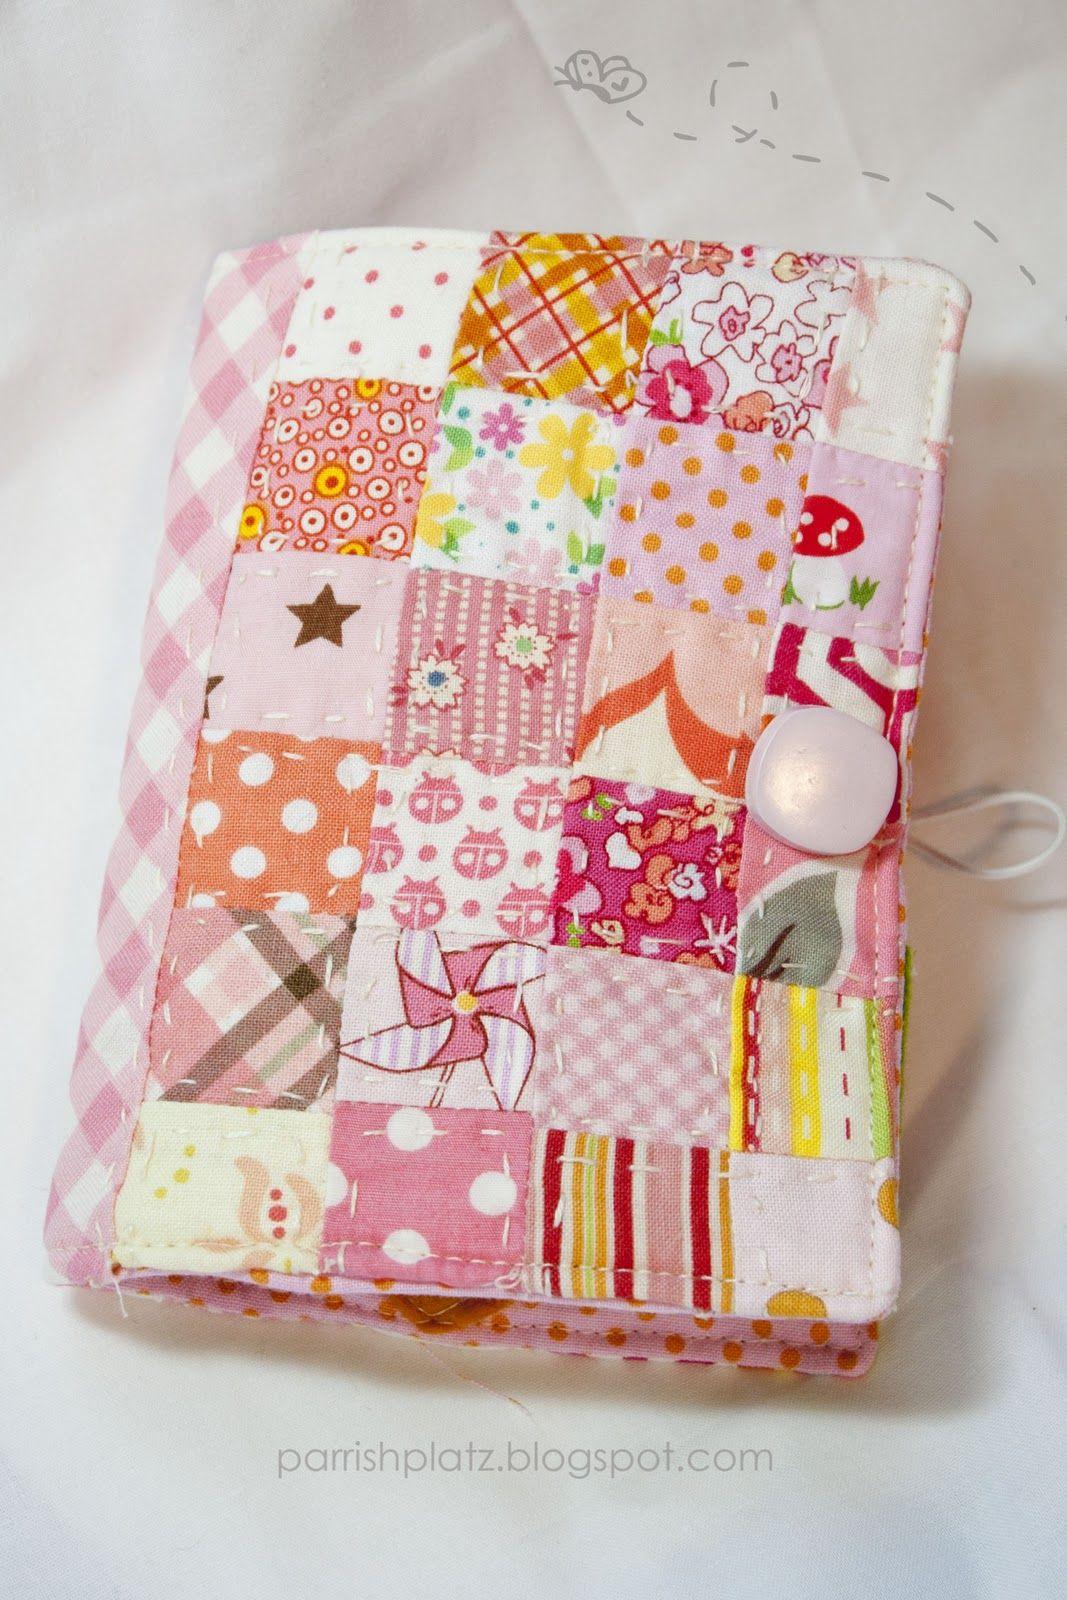 needle book tutorial | Pincushions - Needlebook | Pinterest ...